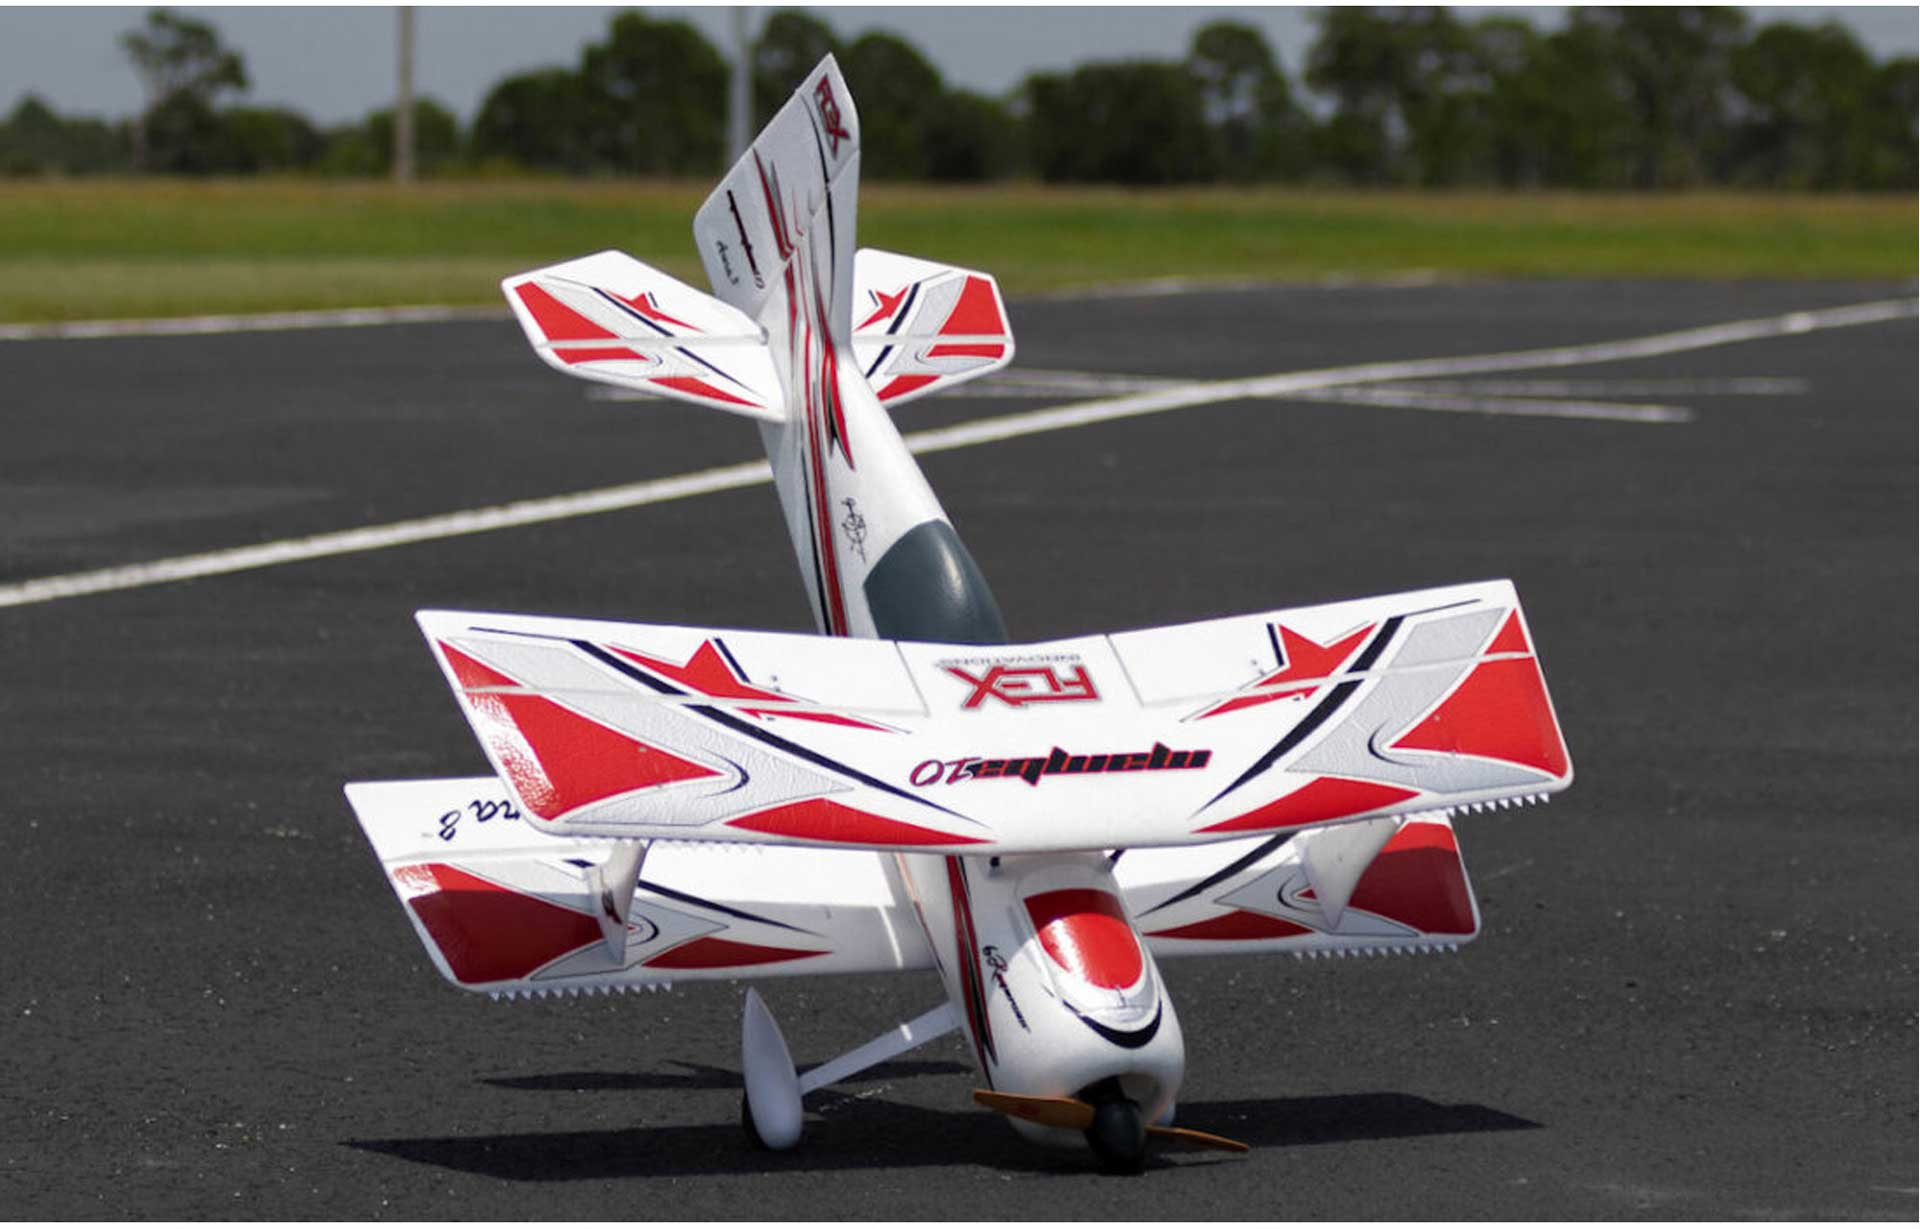 Premier Aircraft Mamba 10 G2 Super PNP Red